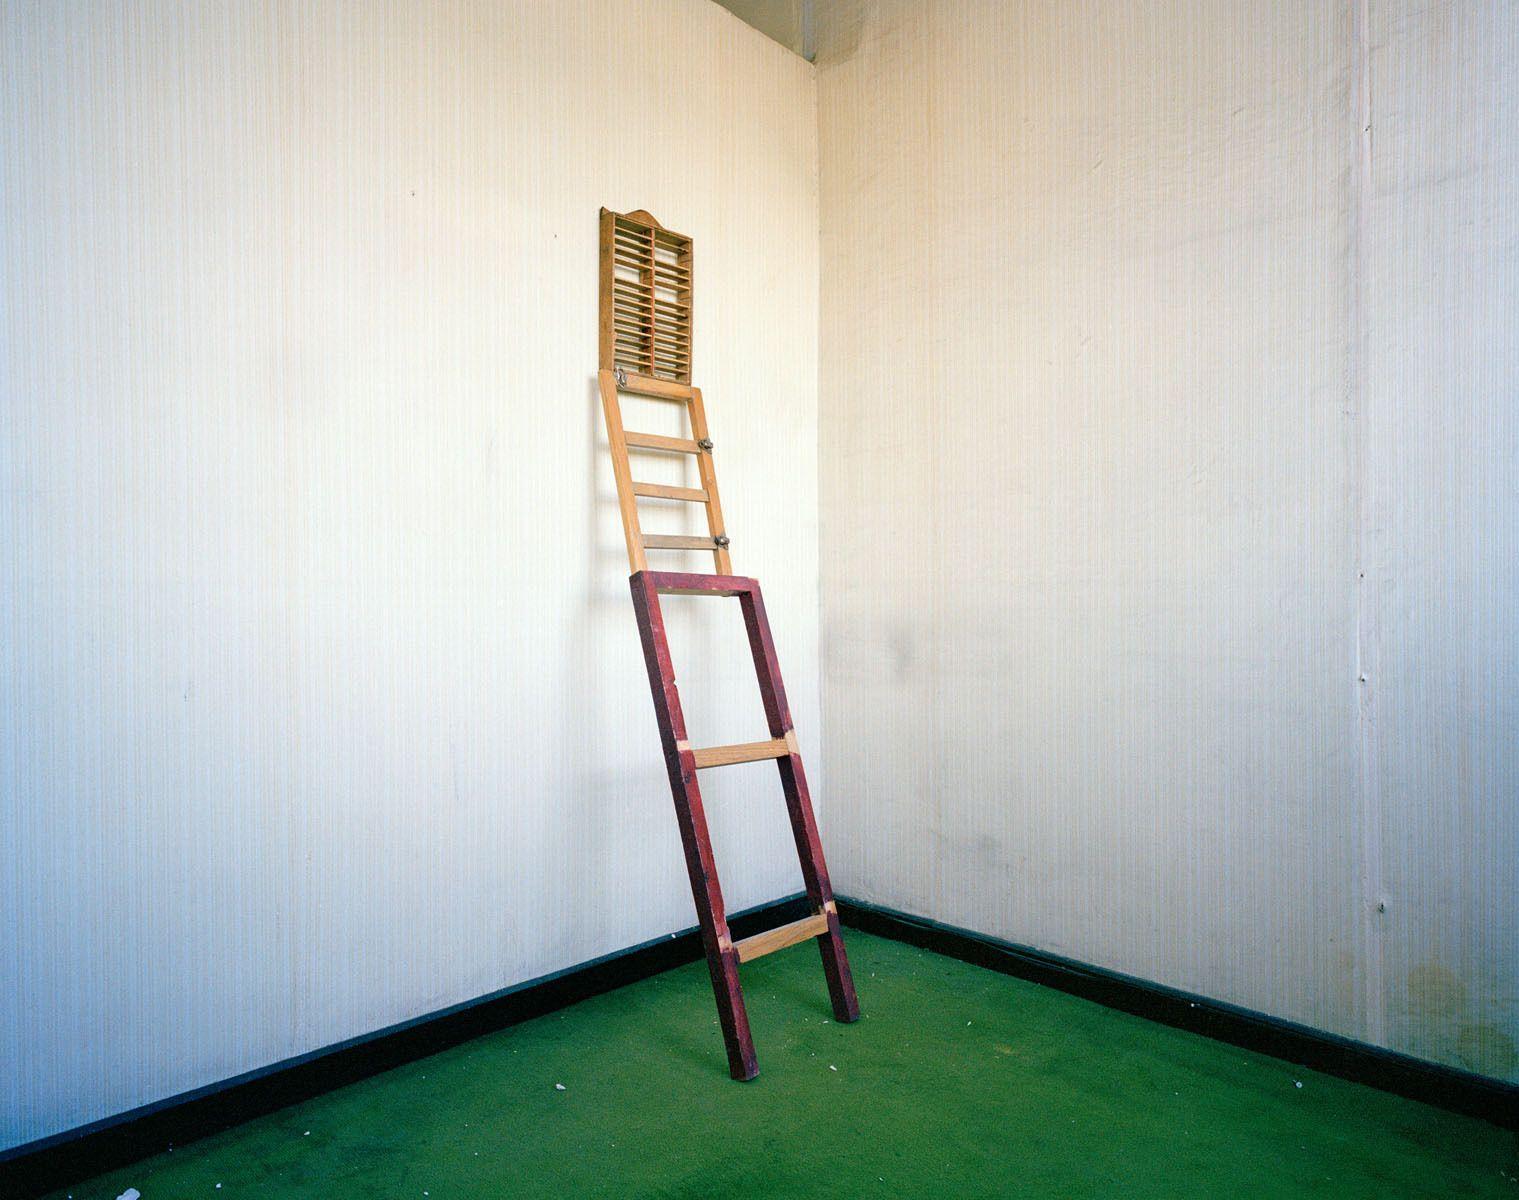 Ladder, 2007